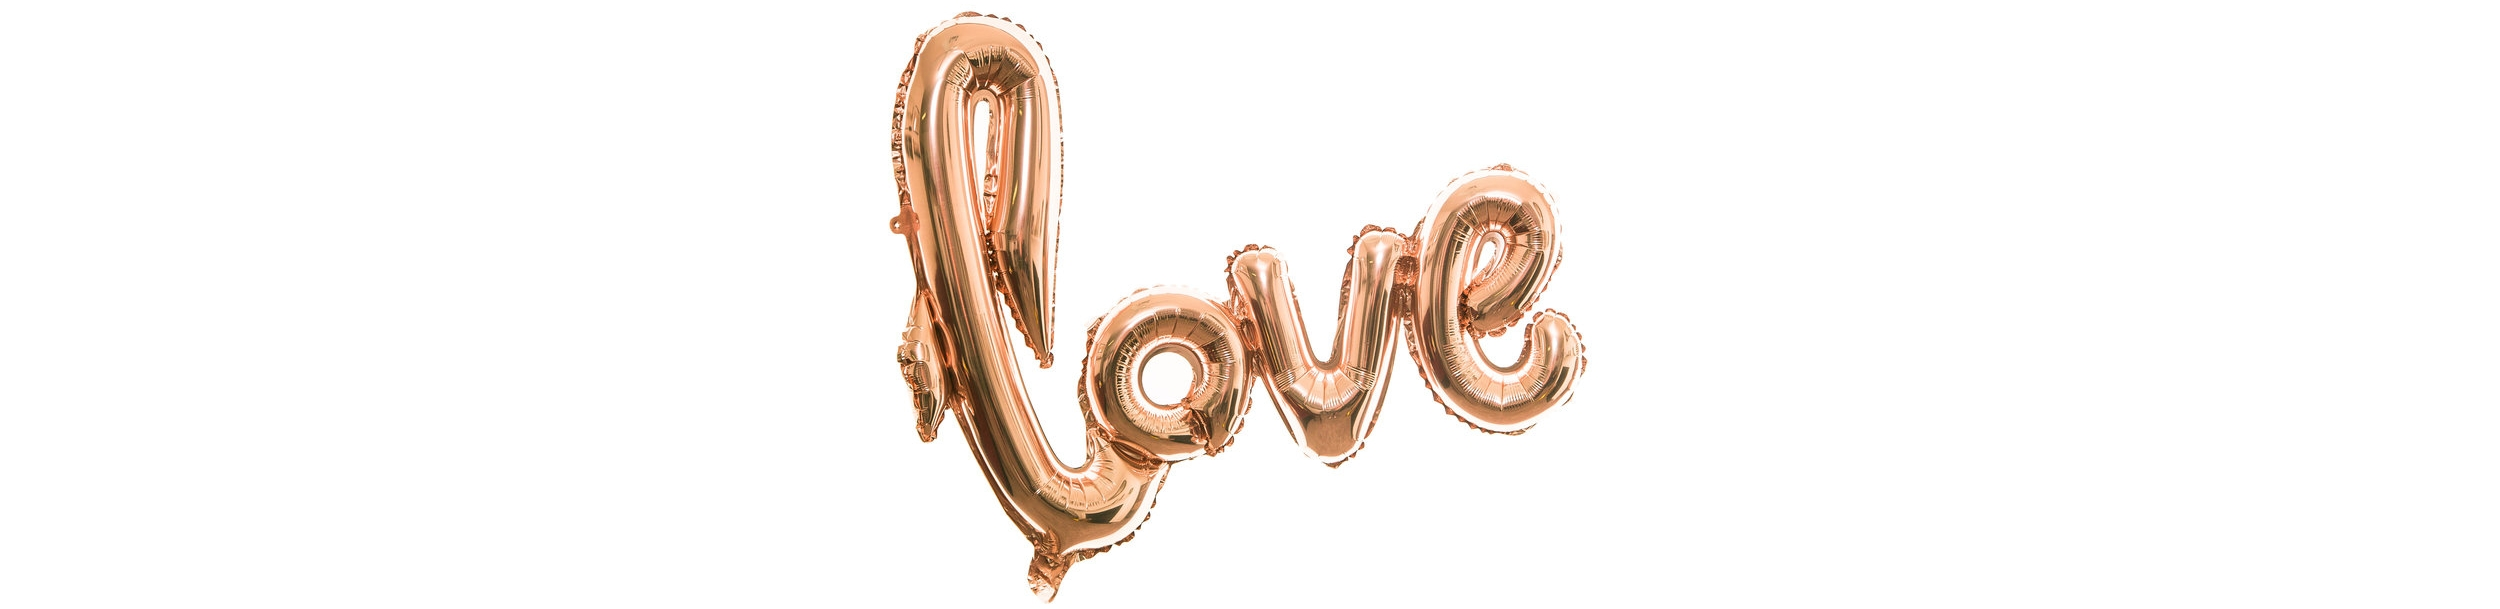 LeBlanc Photo Booth | Love